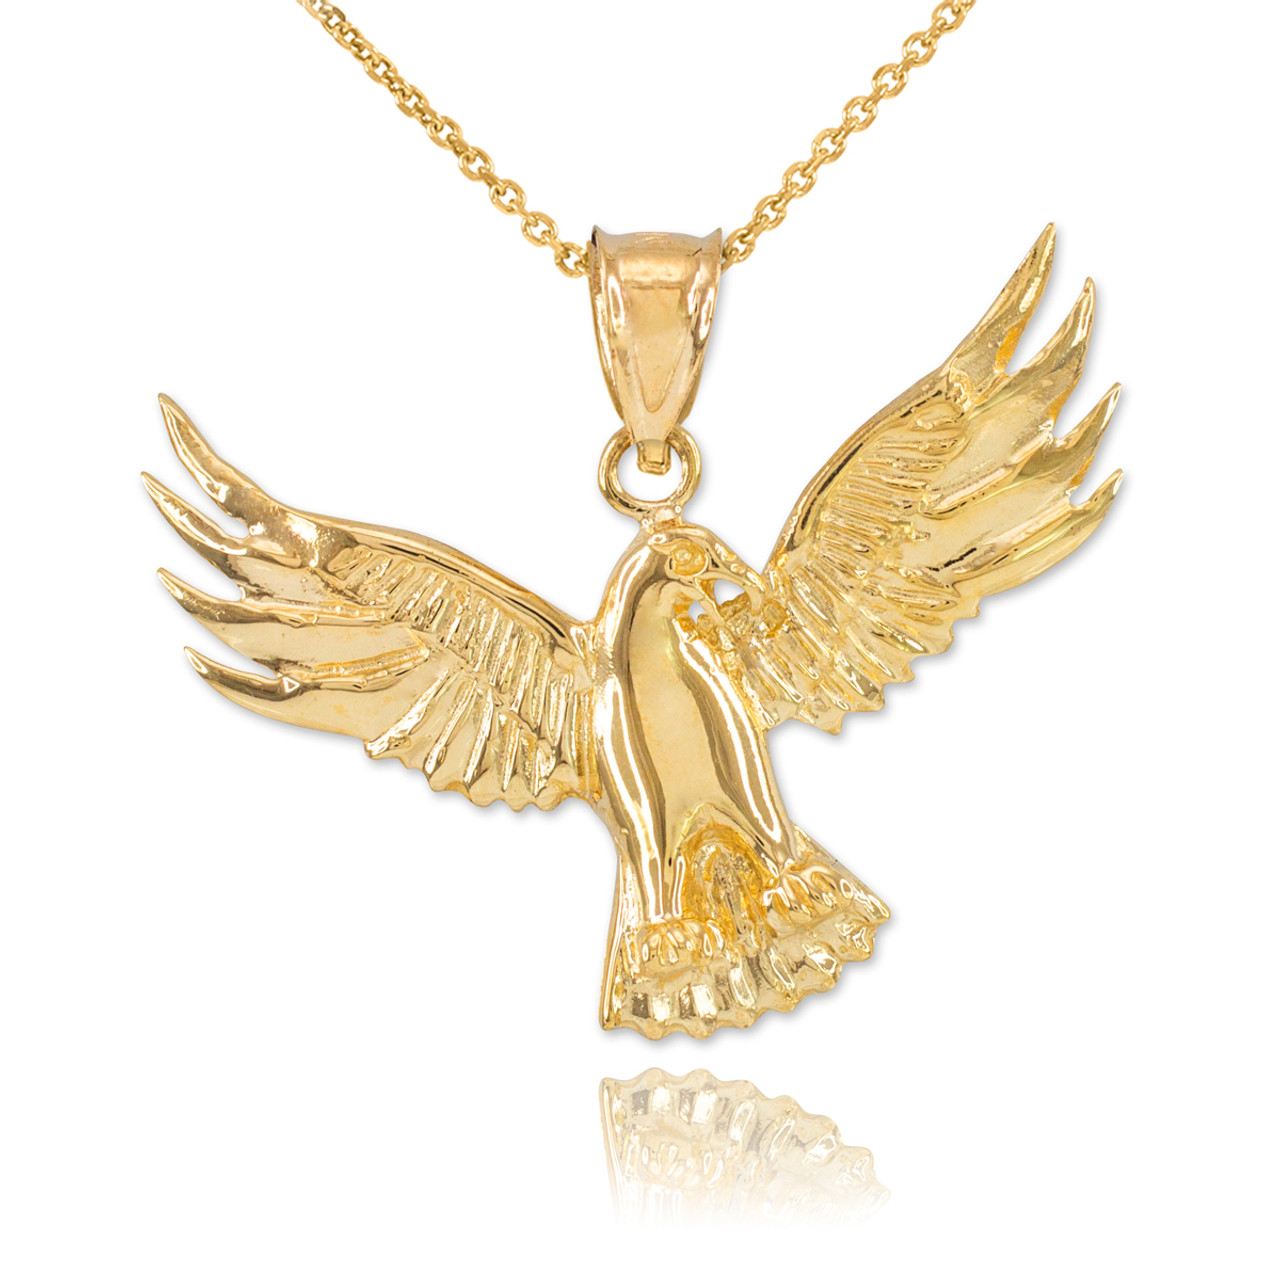 Gold falcon pendant necklace falcon pendants gold falcon pendant necklace aloadofball Image collections